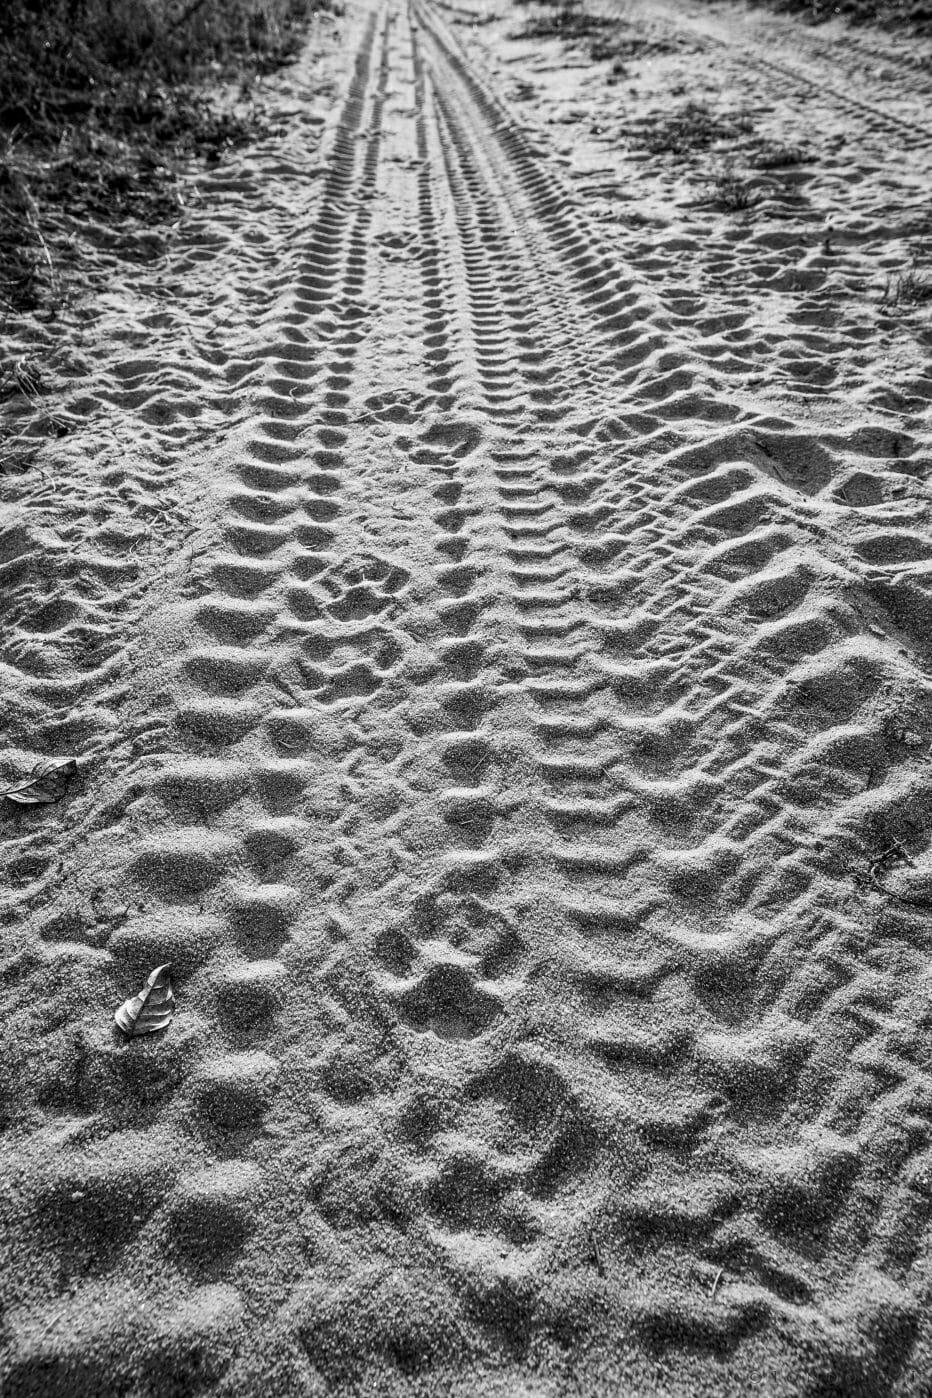 Leopard Tracks Black And White 0239